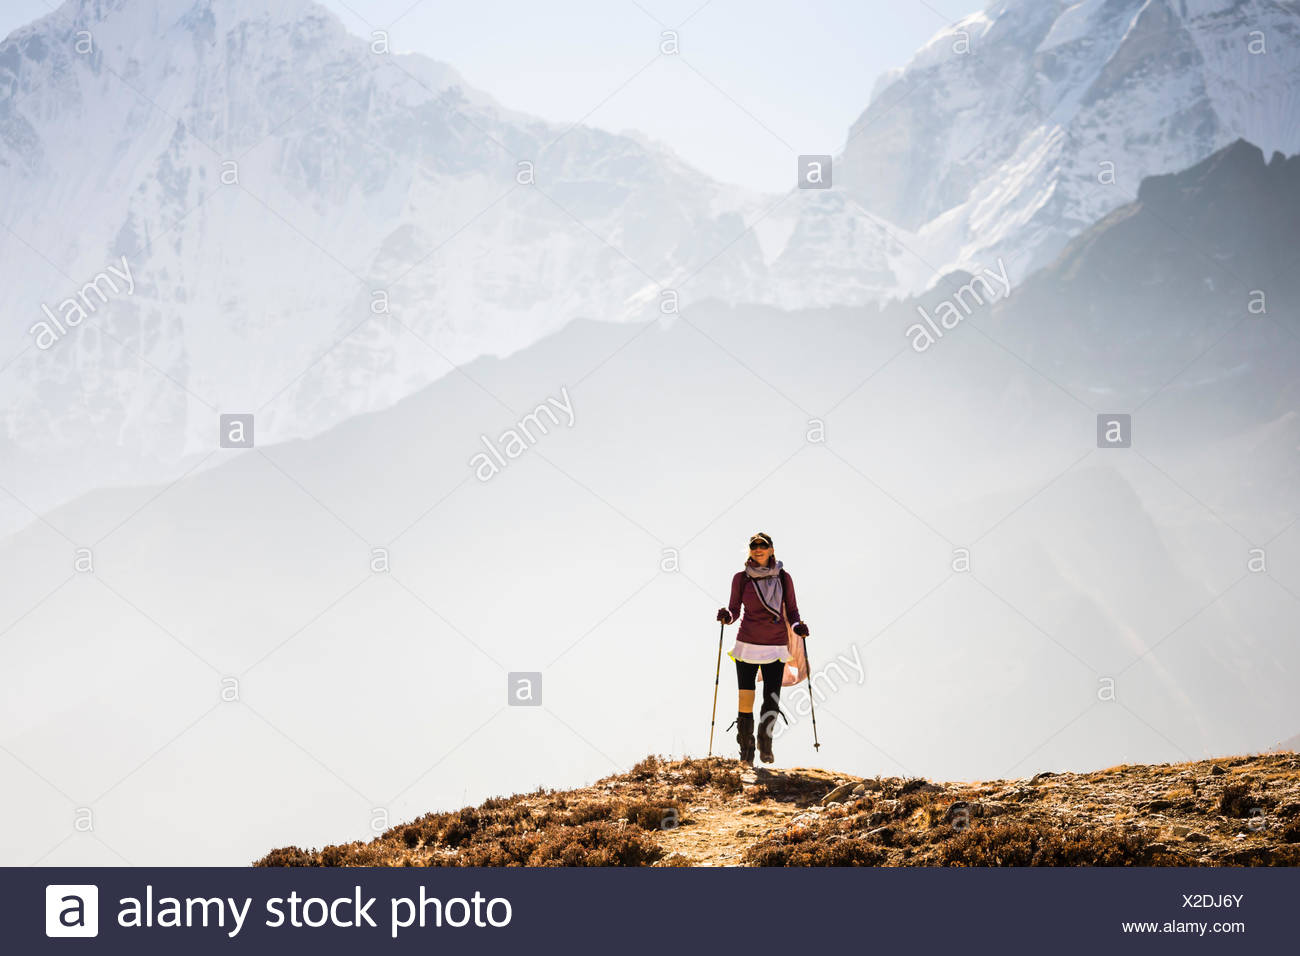 A woman is hiking a trail, Sagarmatha National Park, Khumbu region, Nepal. - Stock Image